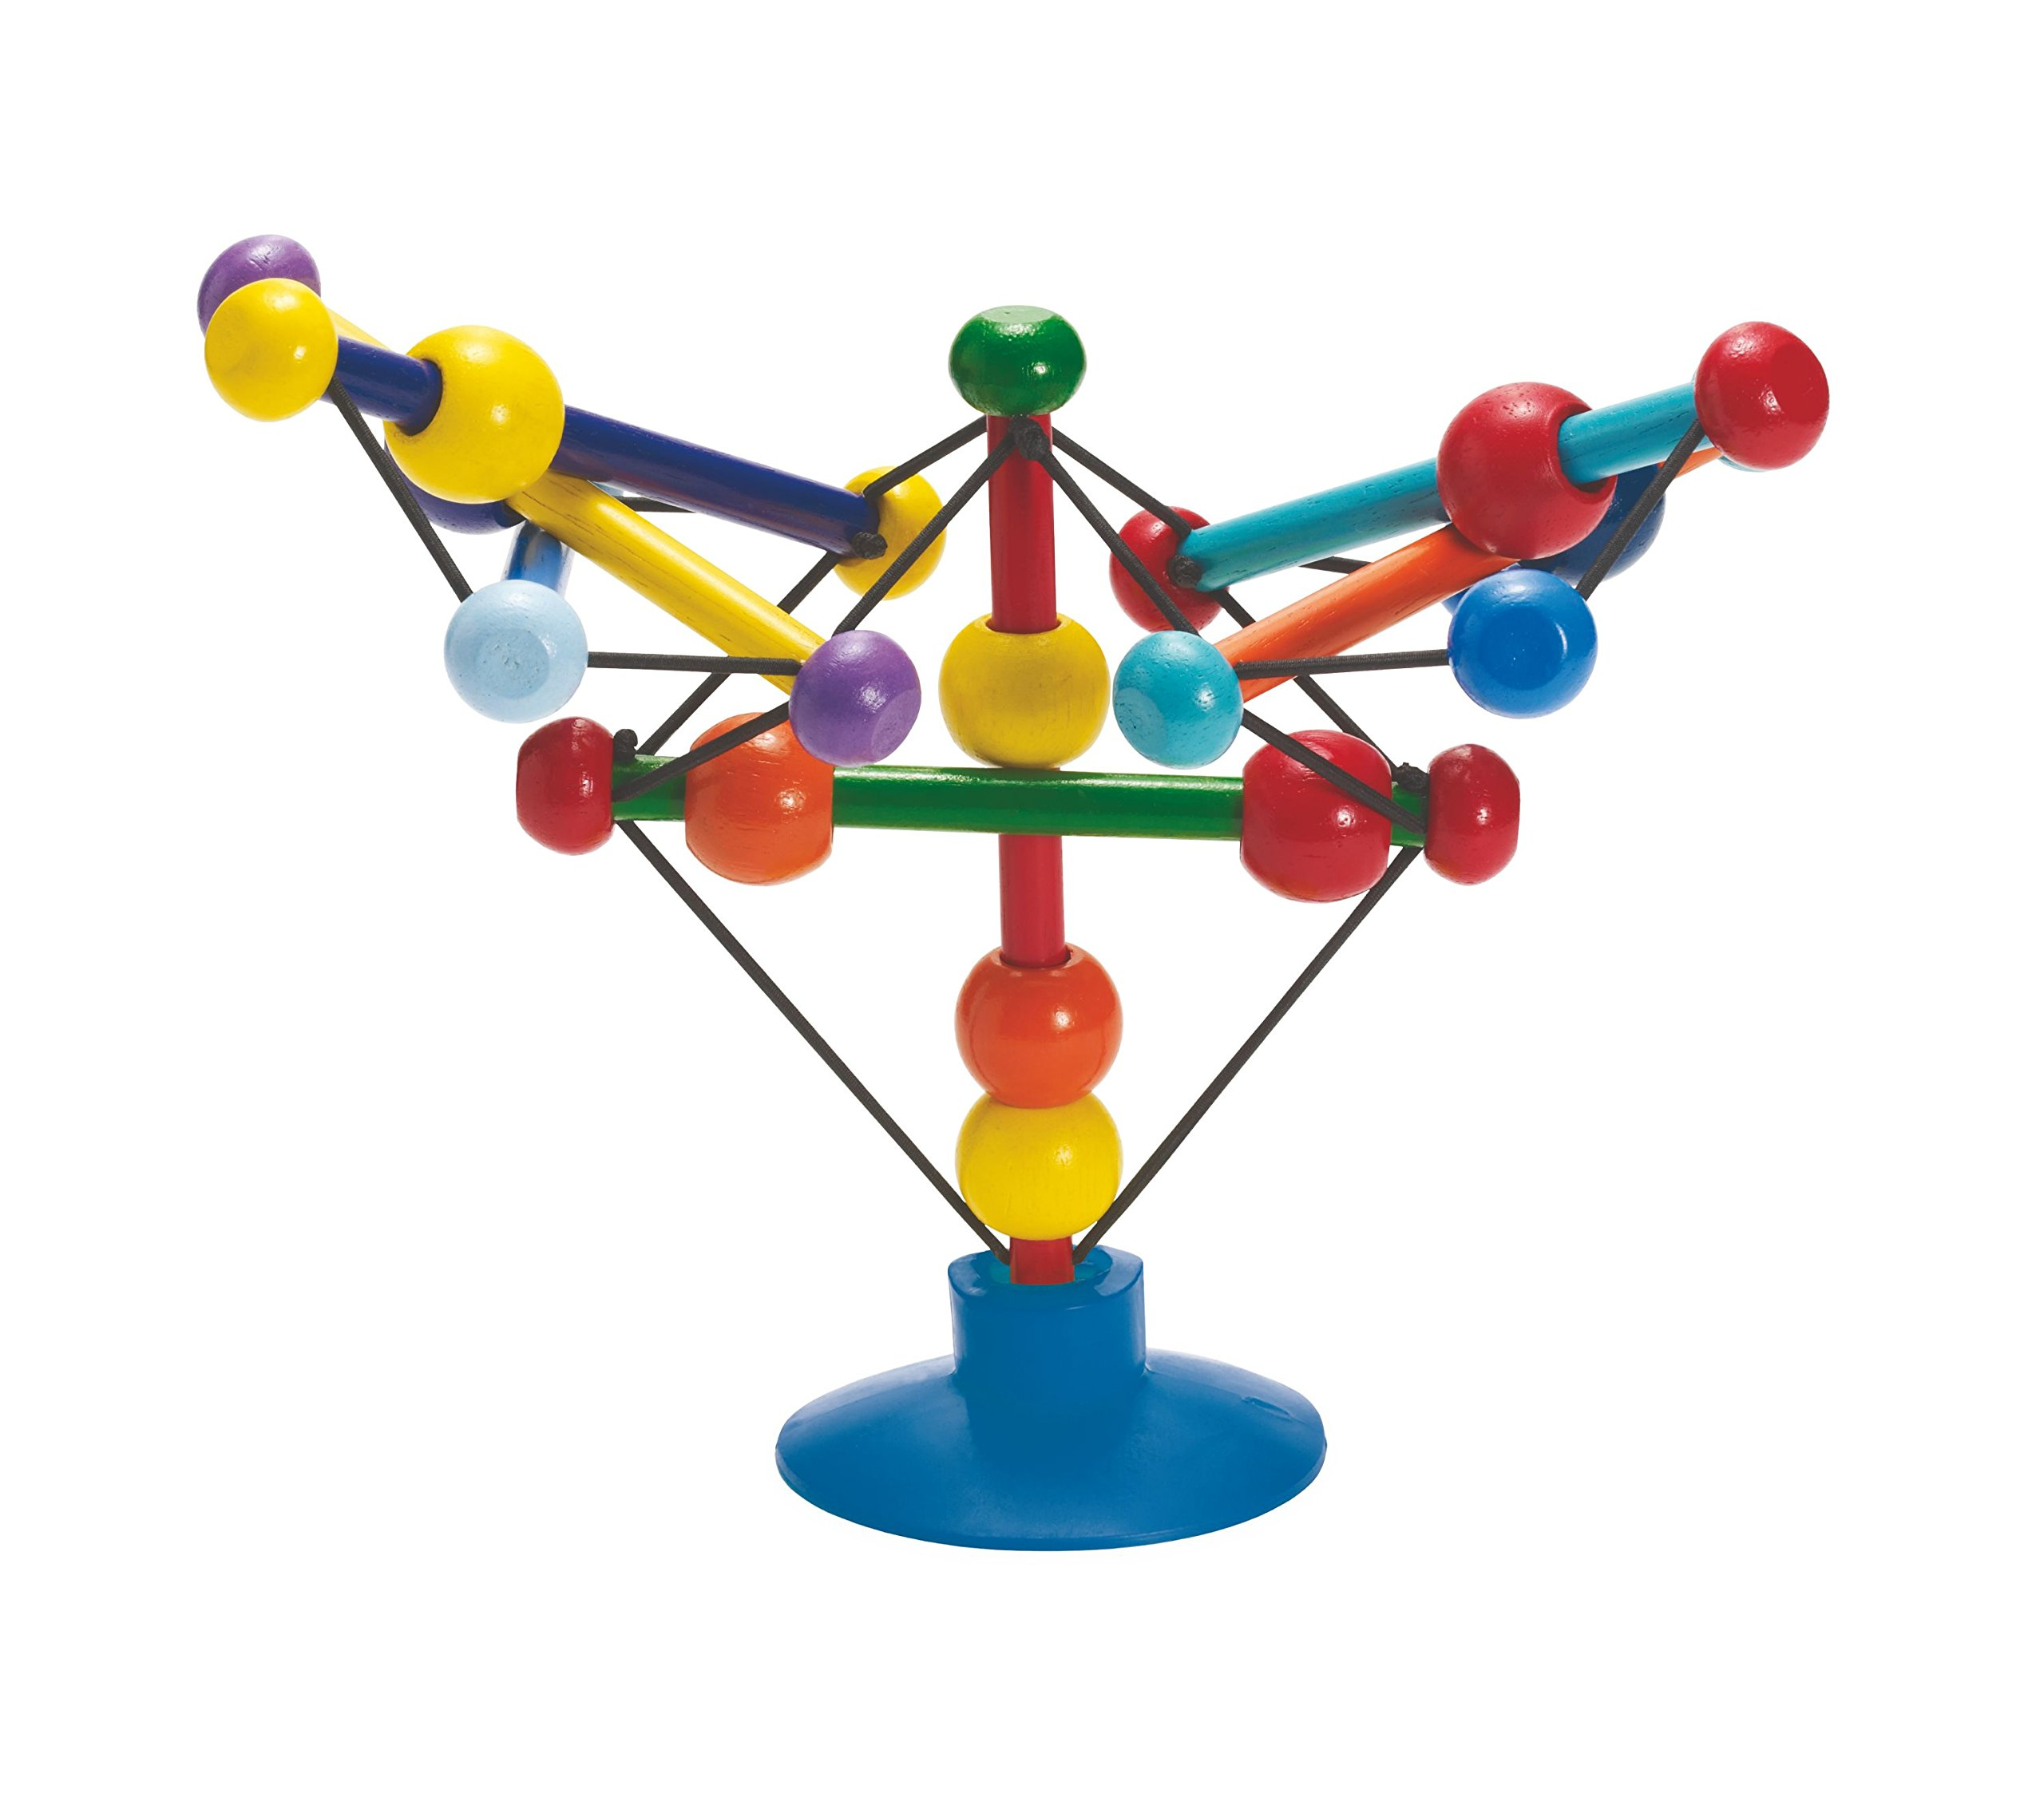 Manhattan Toy 曼哈顿玩具 Skwish Stix婴儿桌上吸力活动玩具